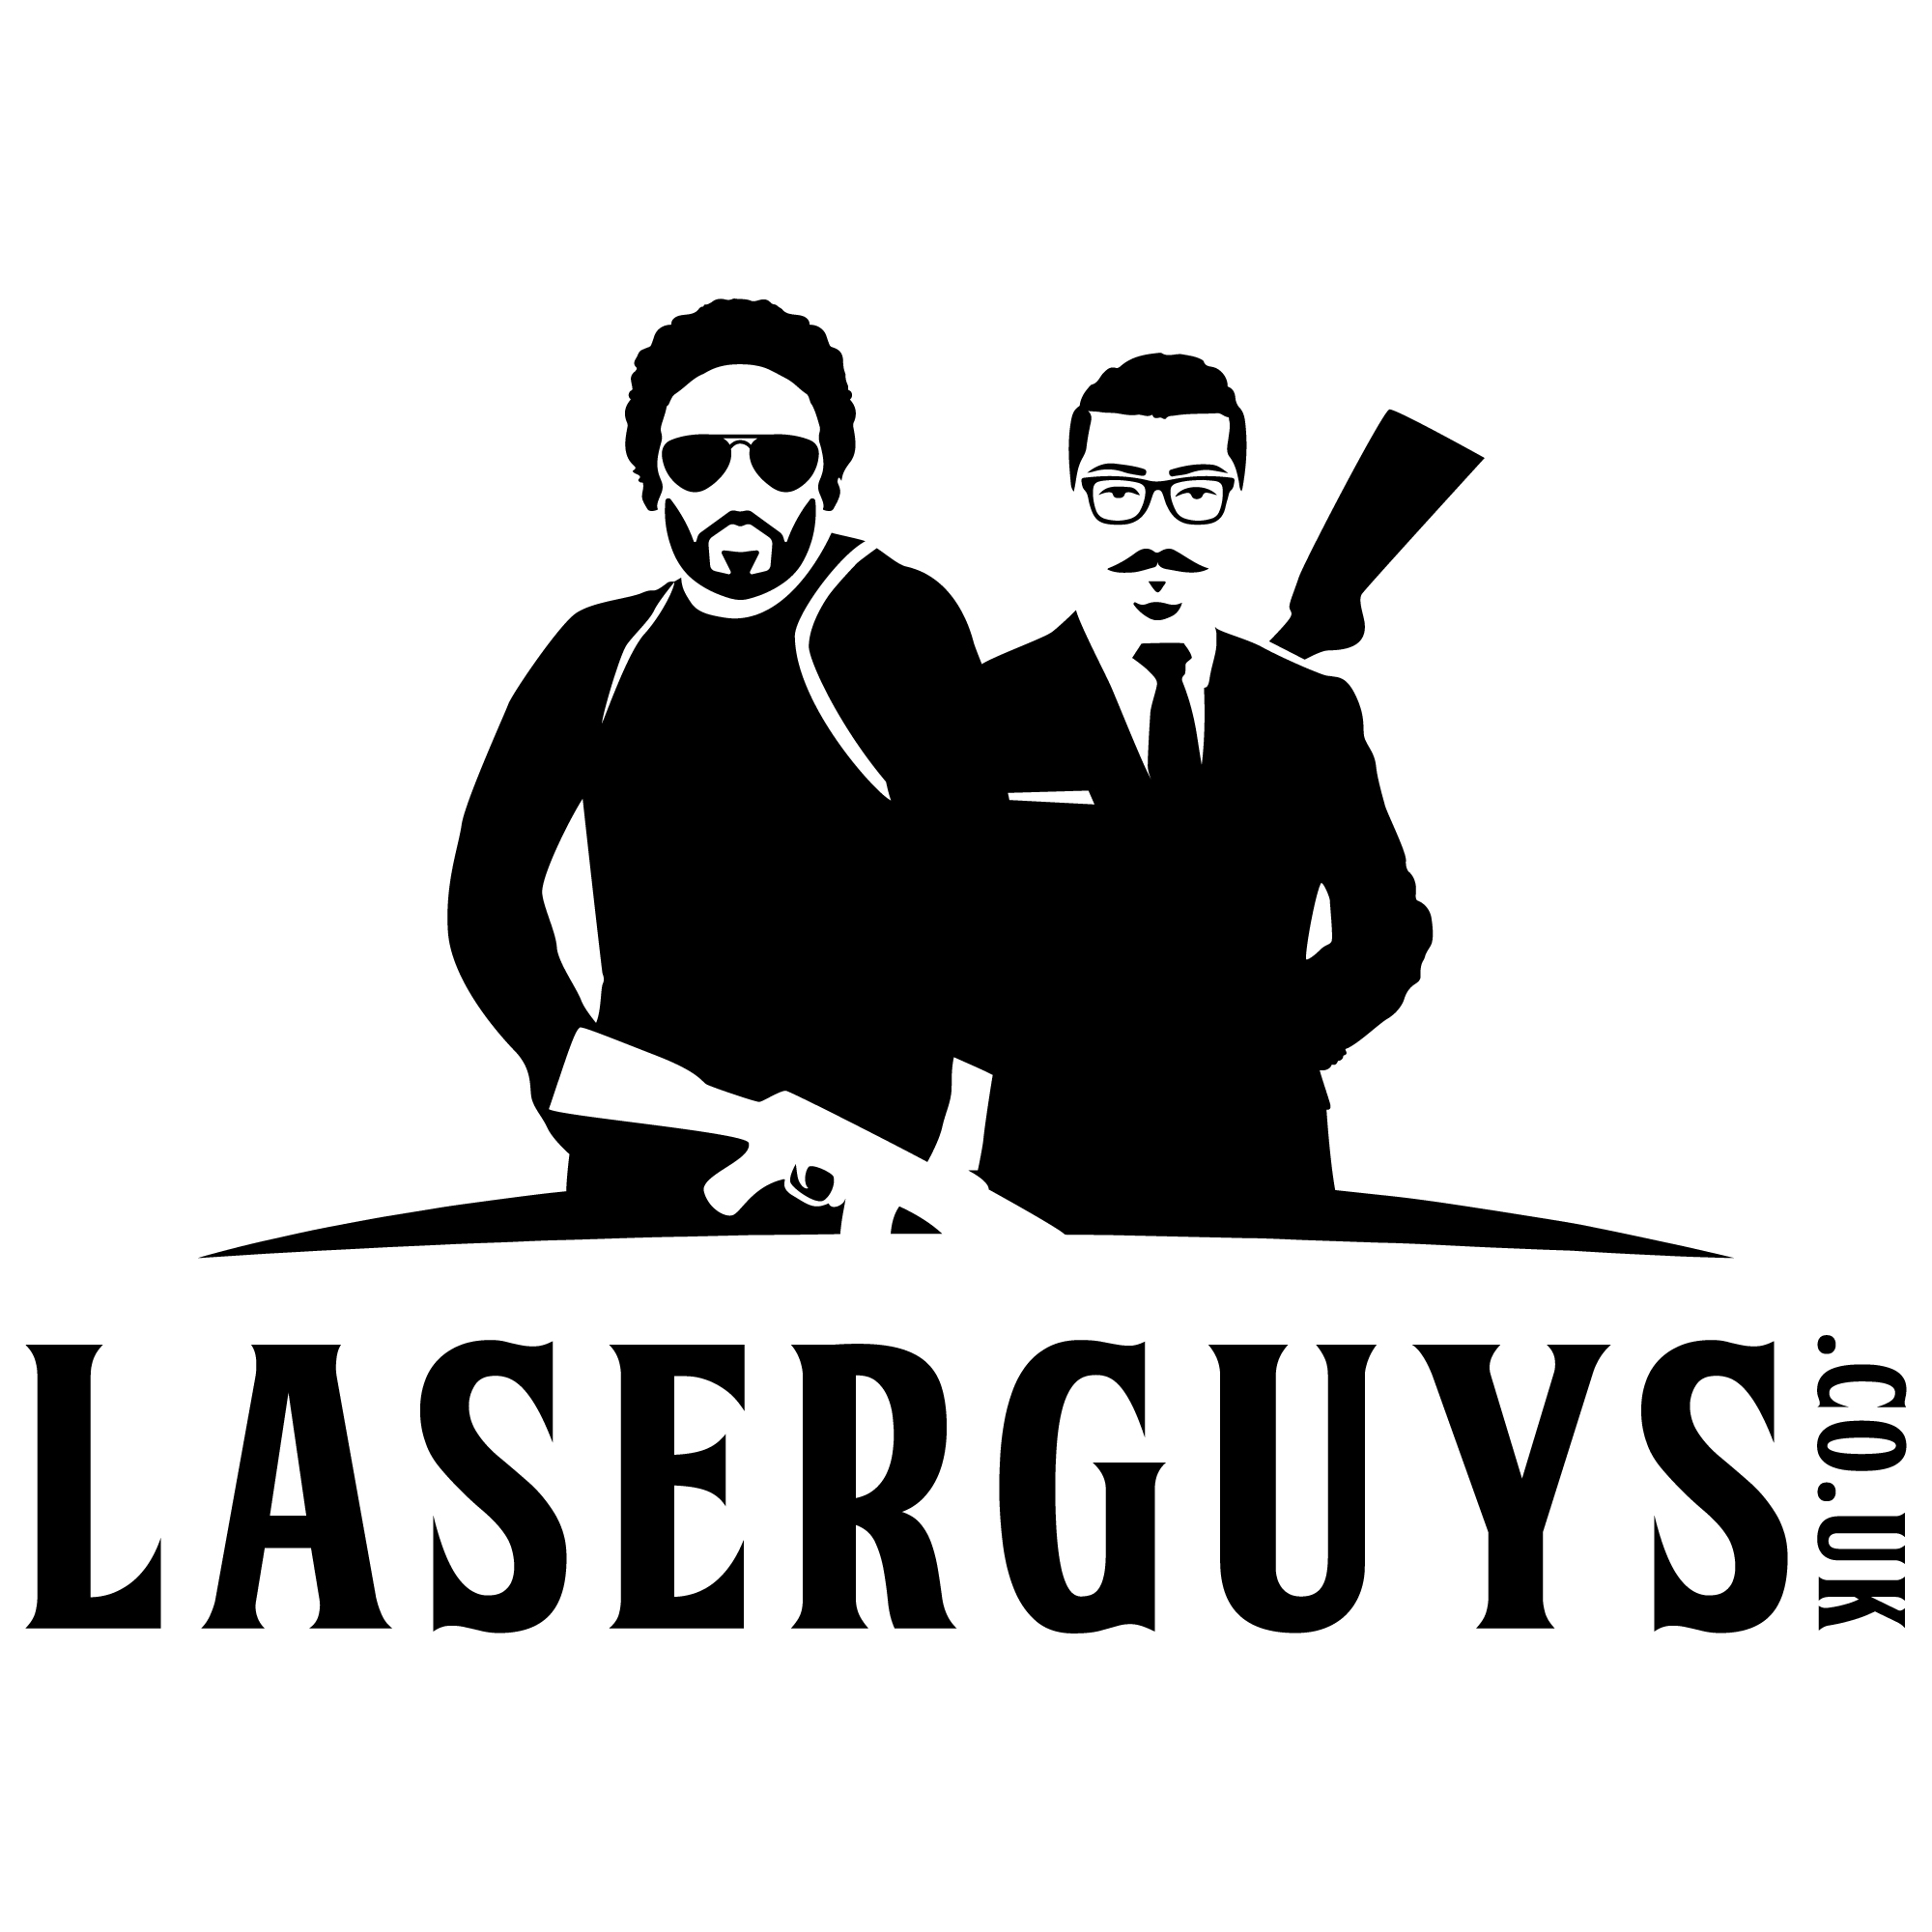 Laserguys Laser Tag logo